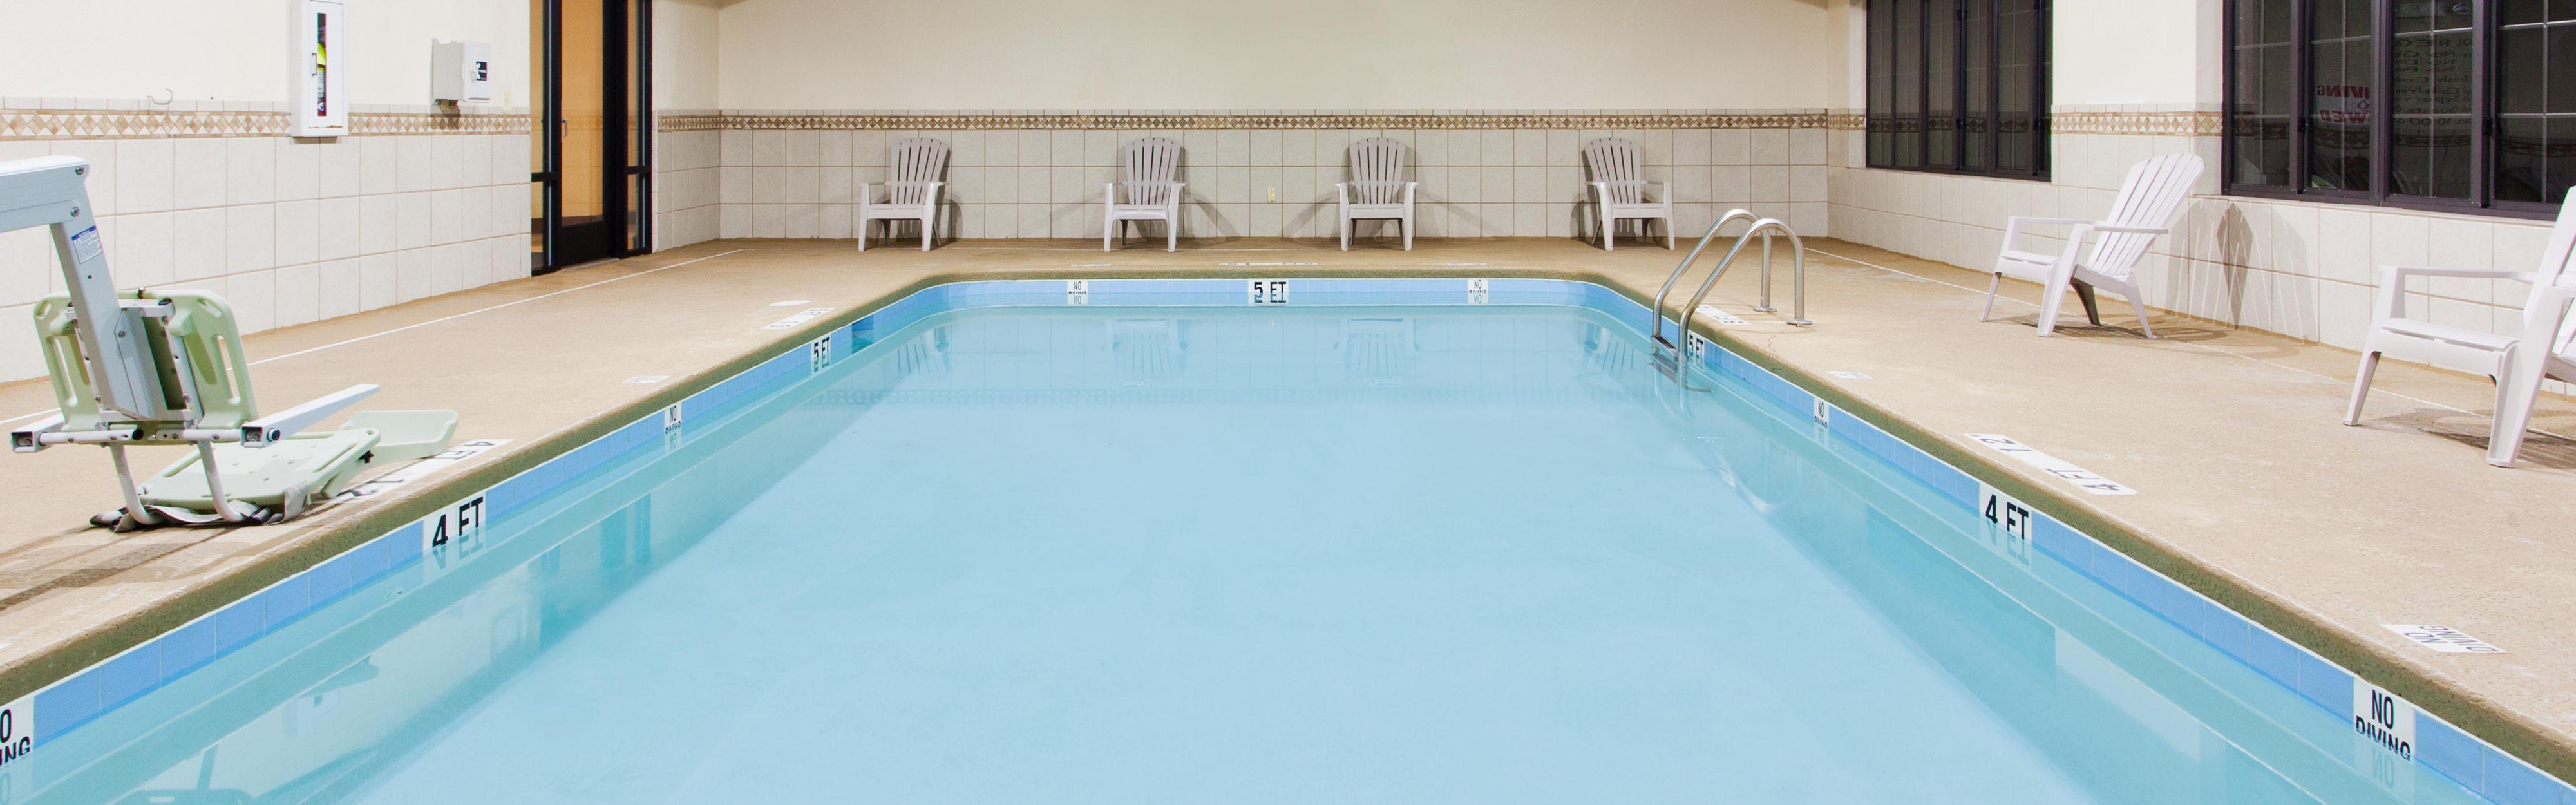 Holiday Inn Express & Suites Douglas image 2